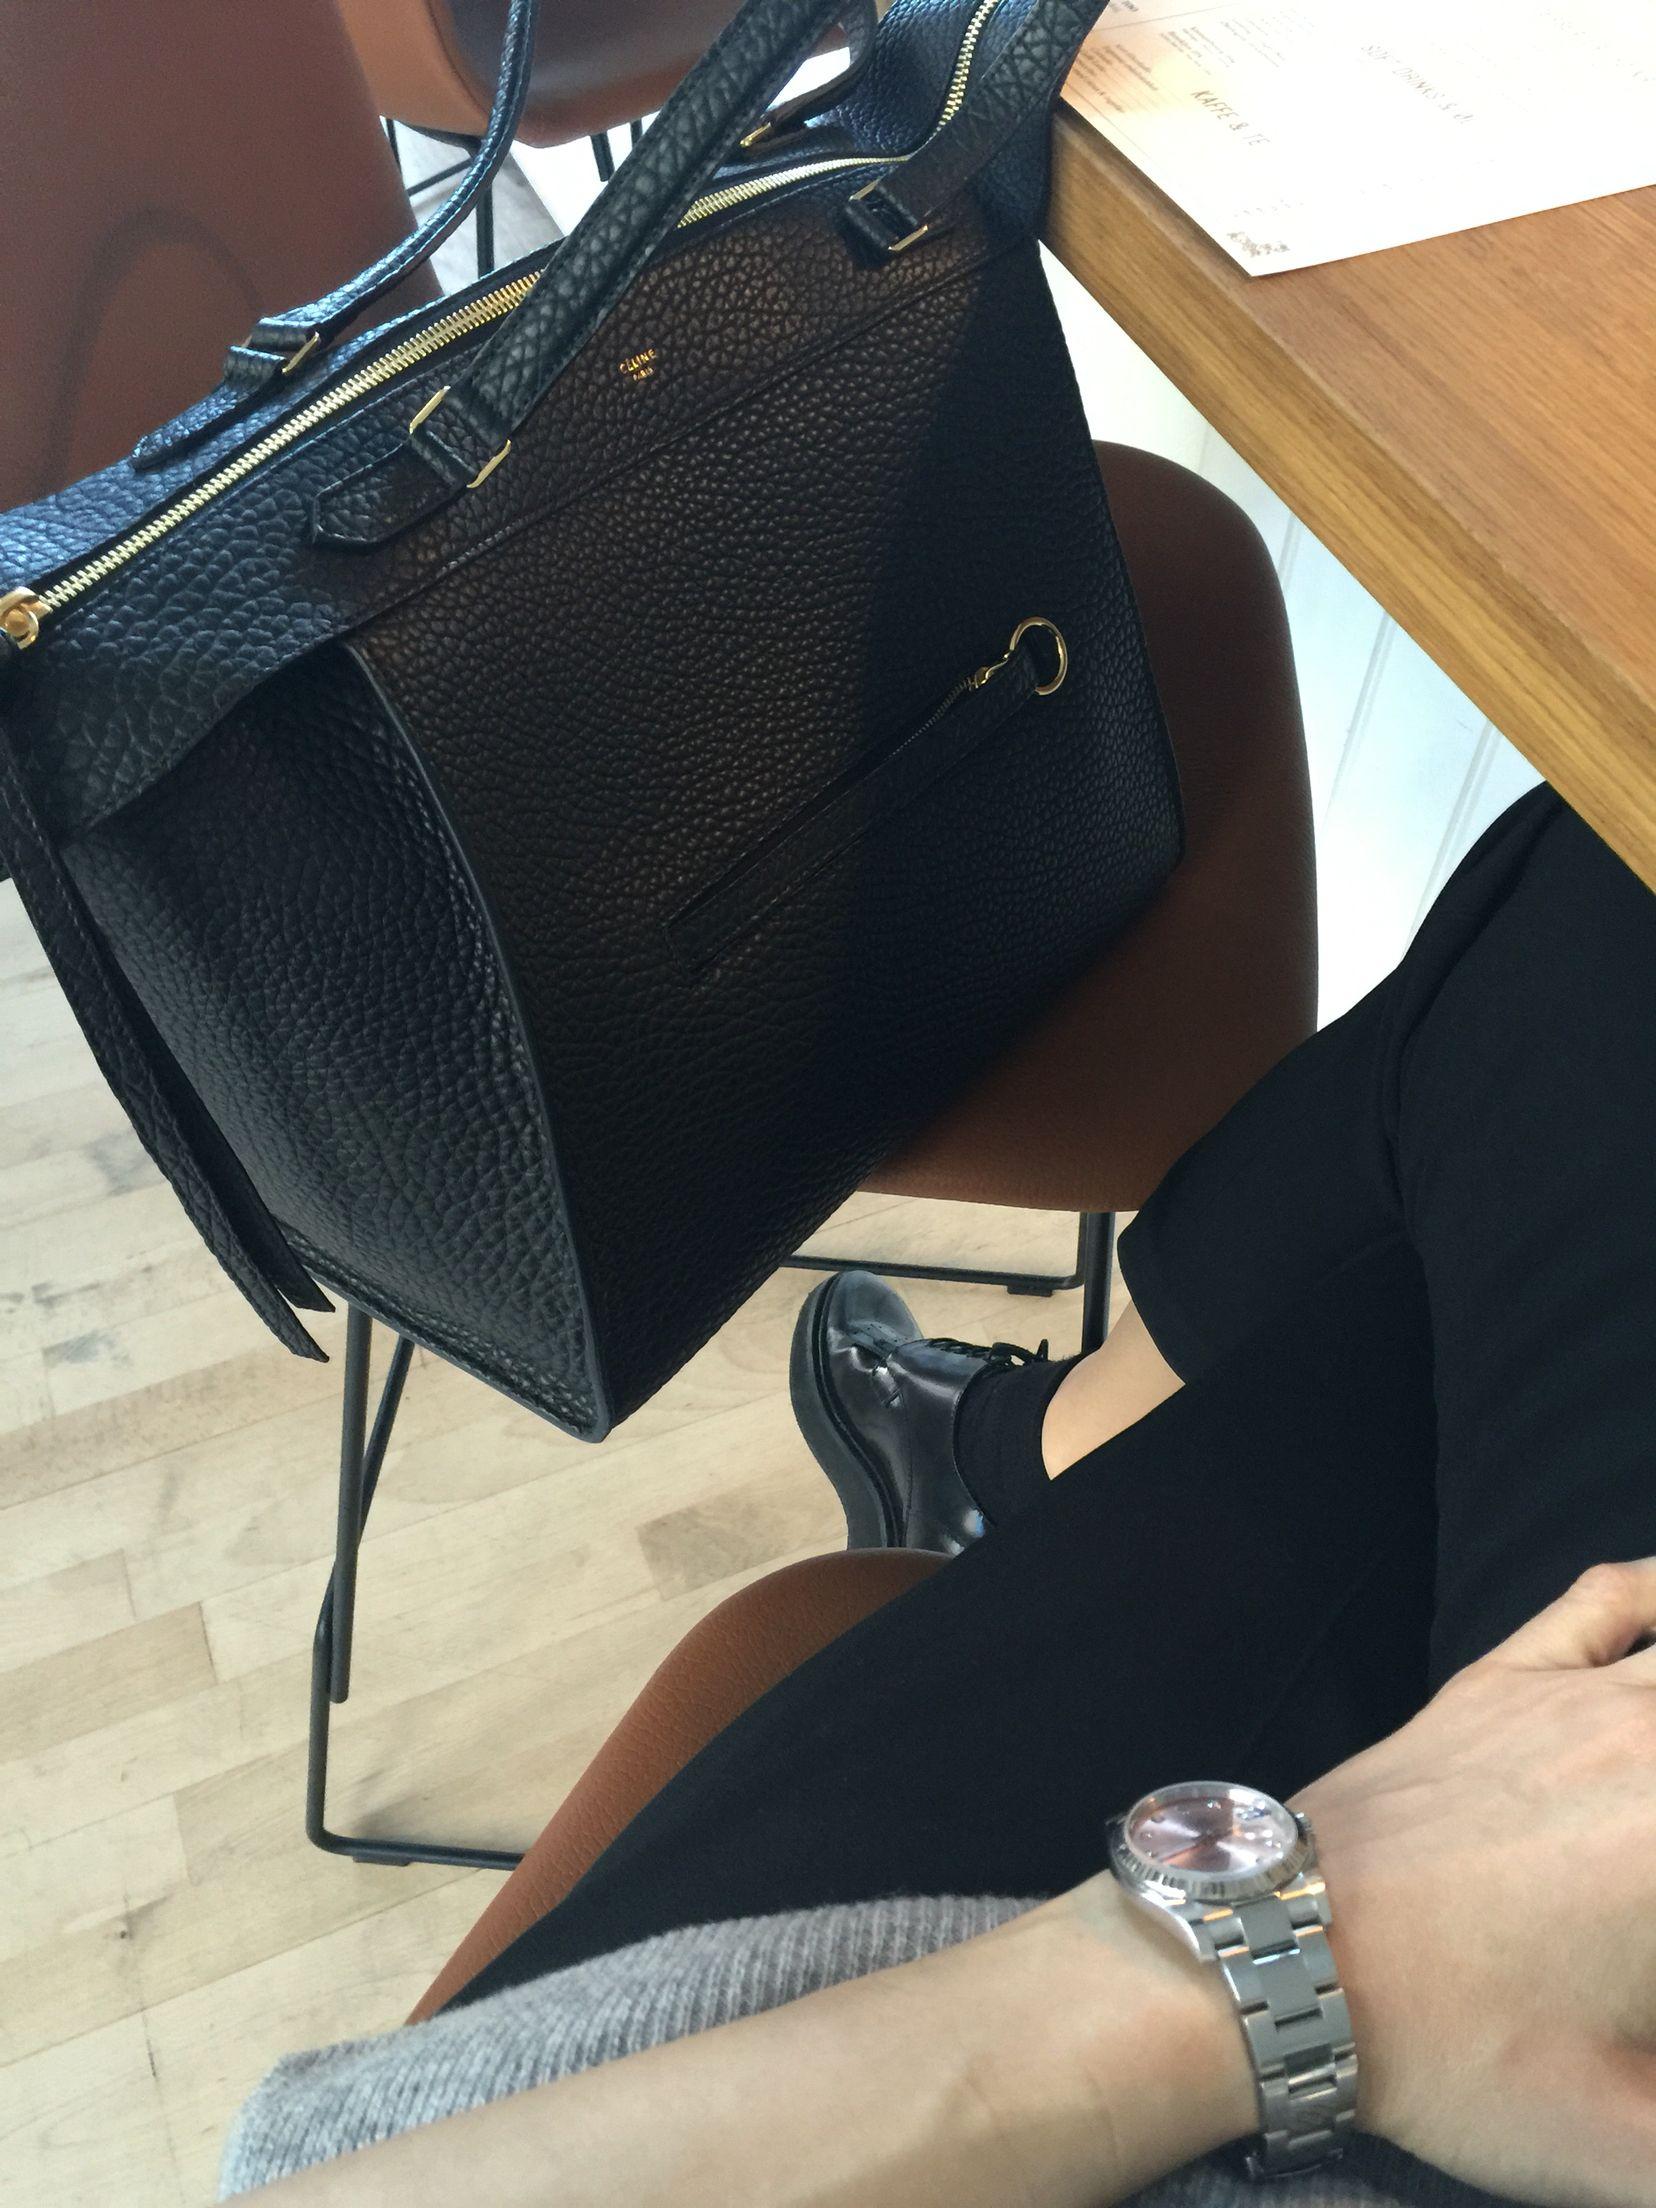 c060a65300b4 Celine ring bag luxury goods bags handbags street chic jpg 1656x2208 Street  chic celine bag